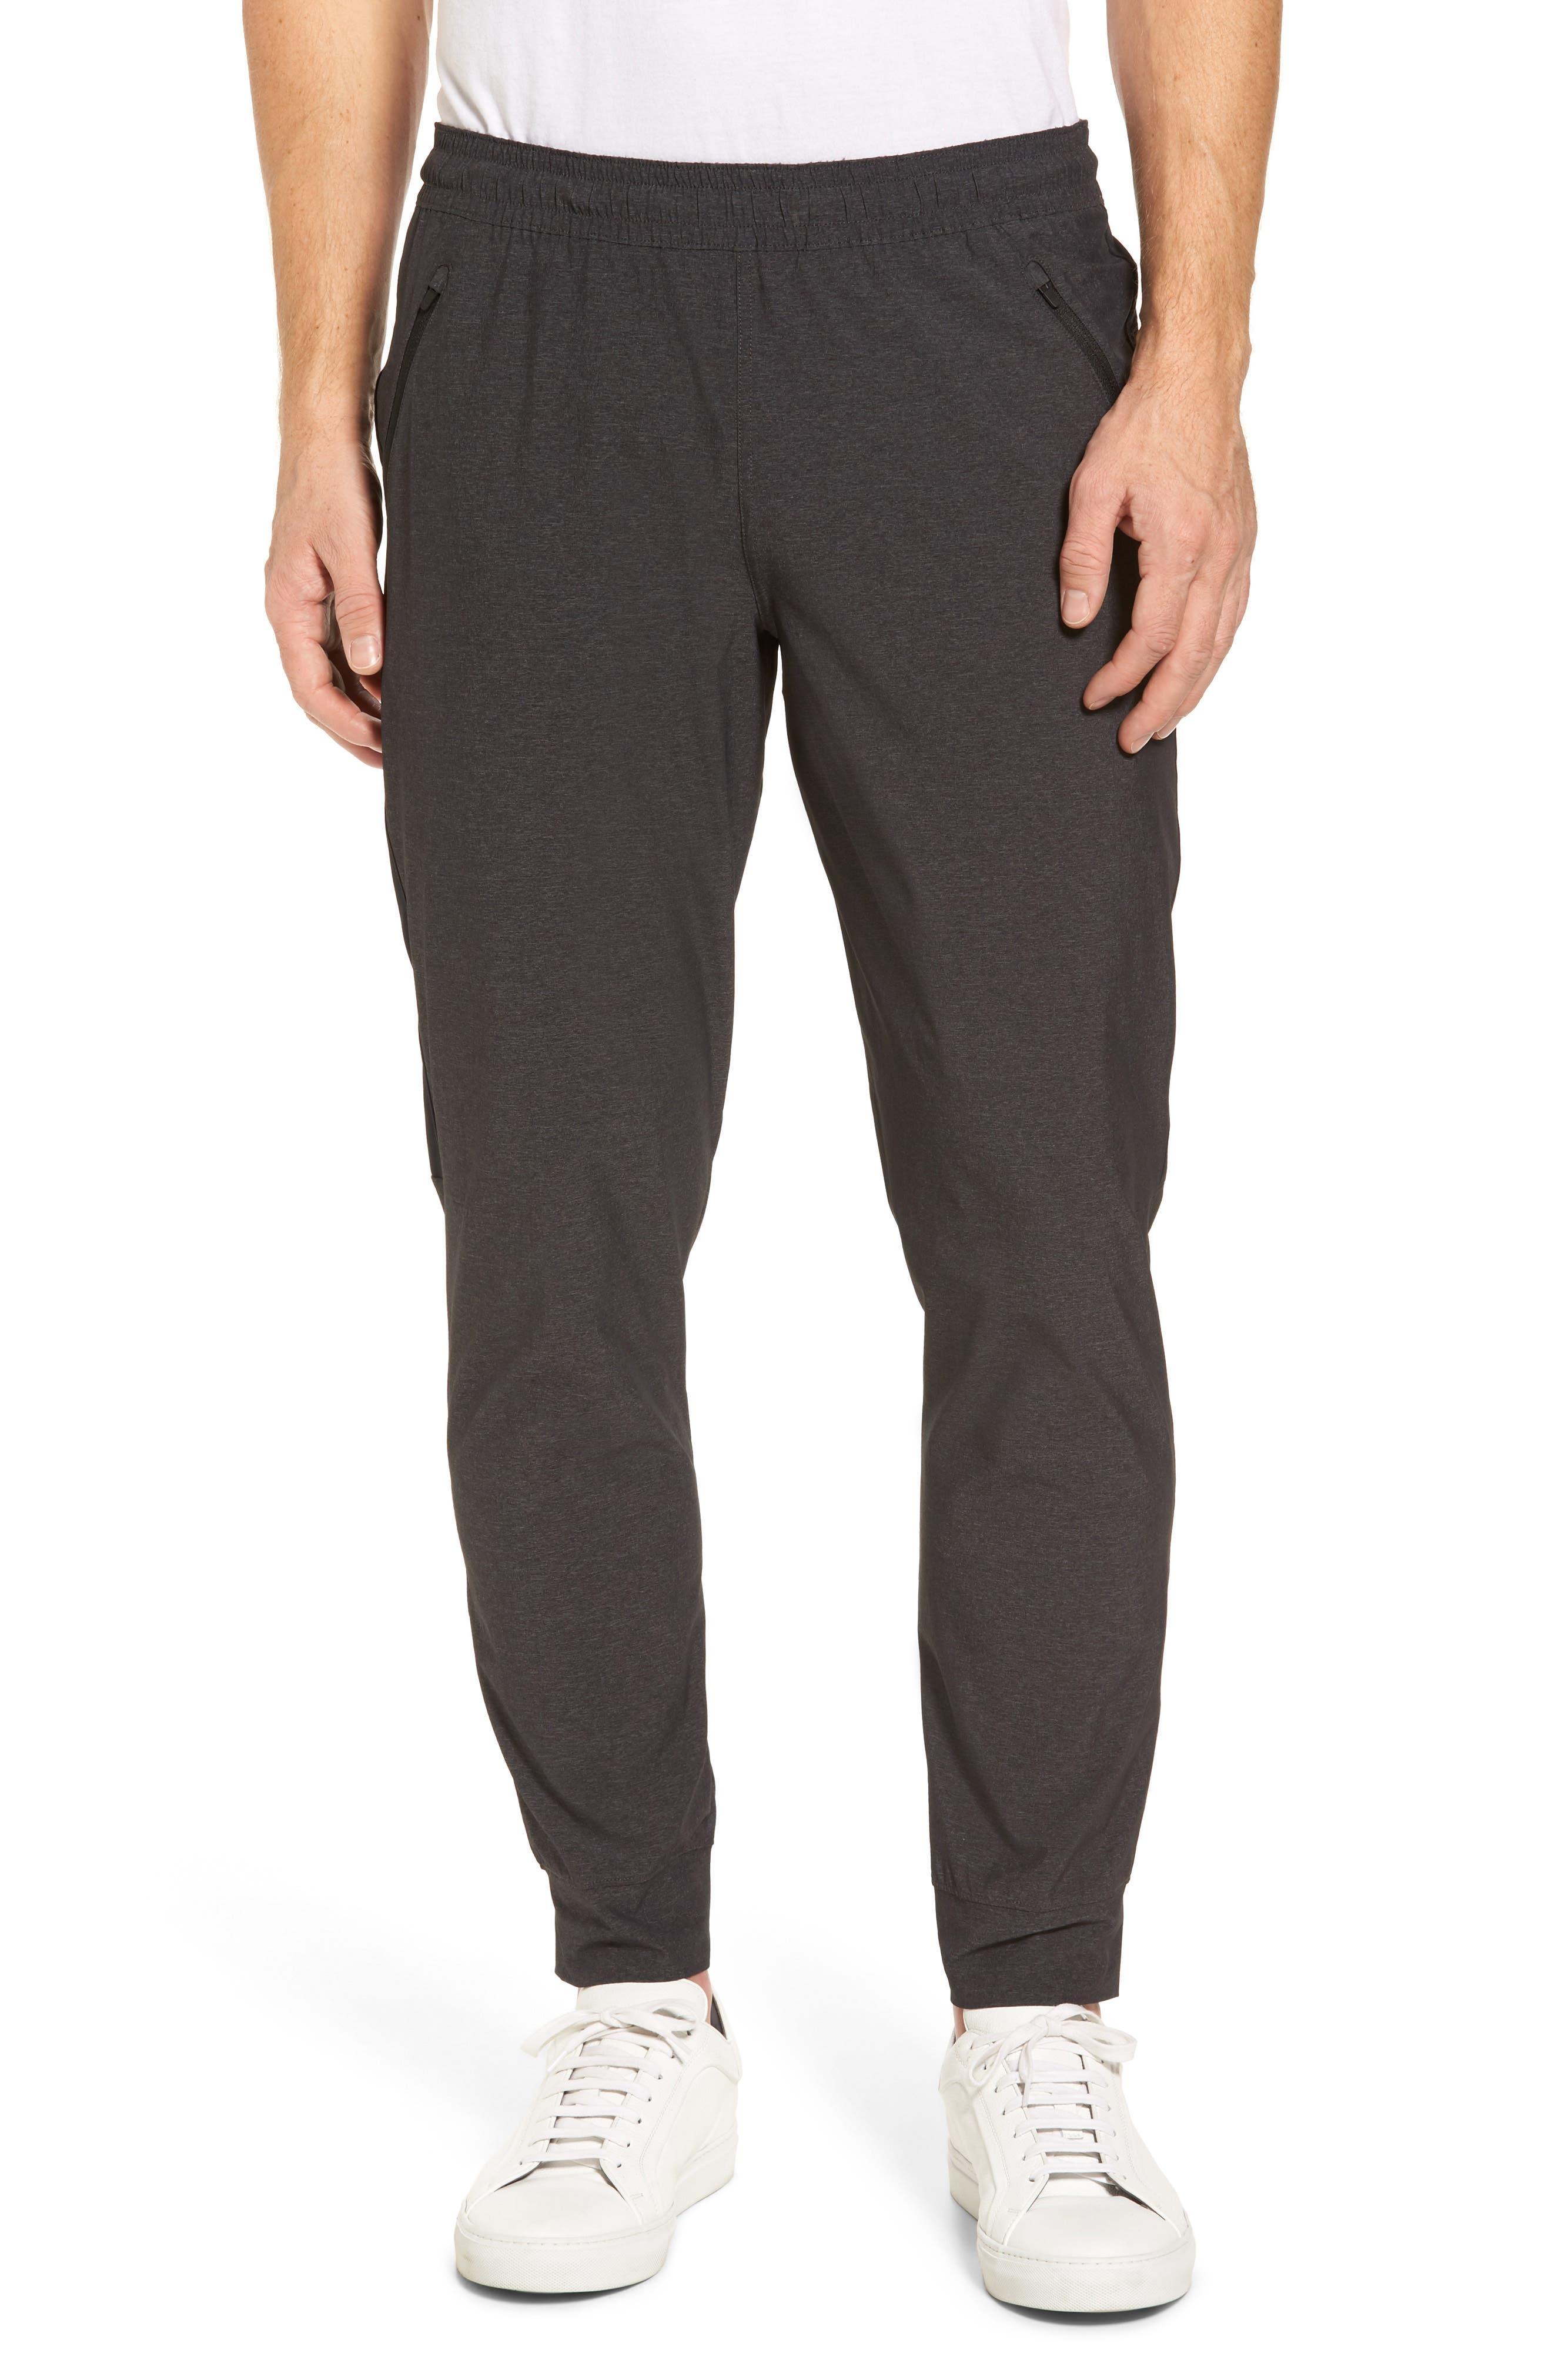 Zella Zip Pocket Sweatpants